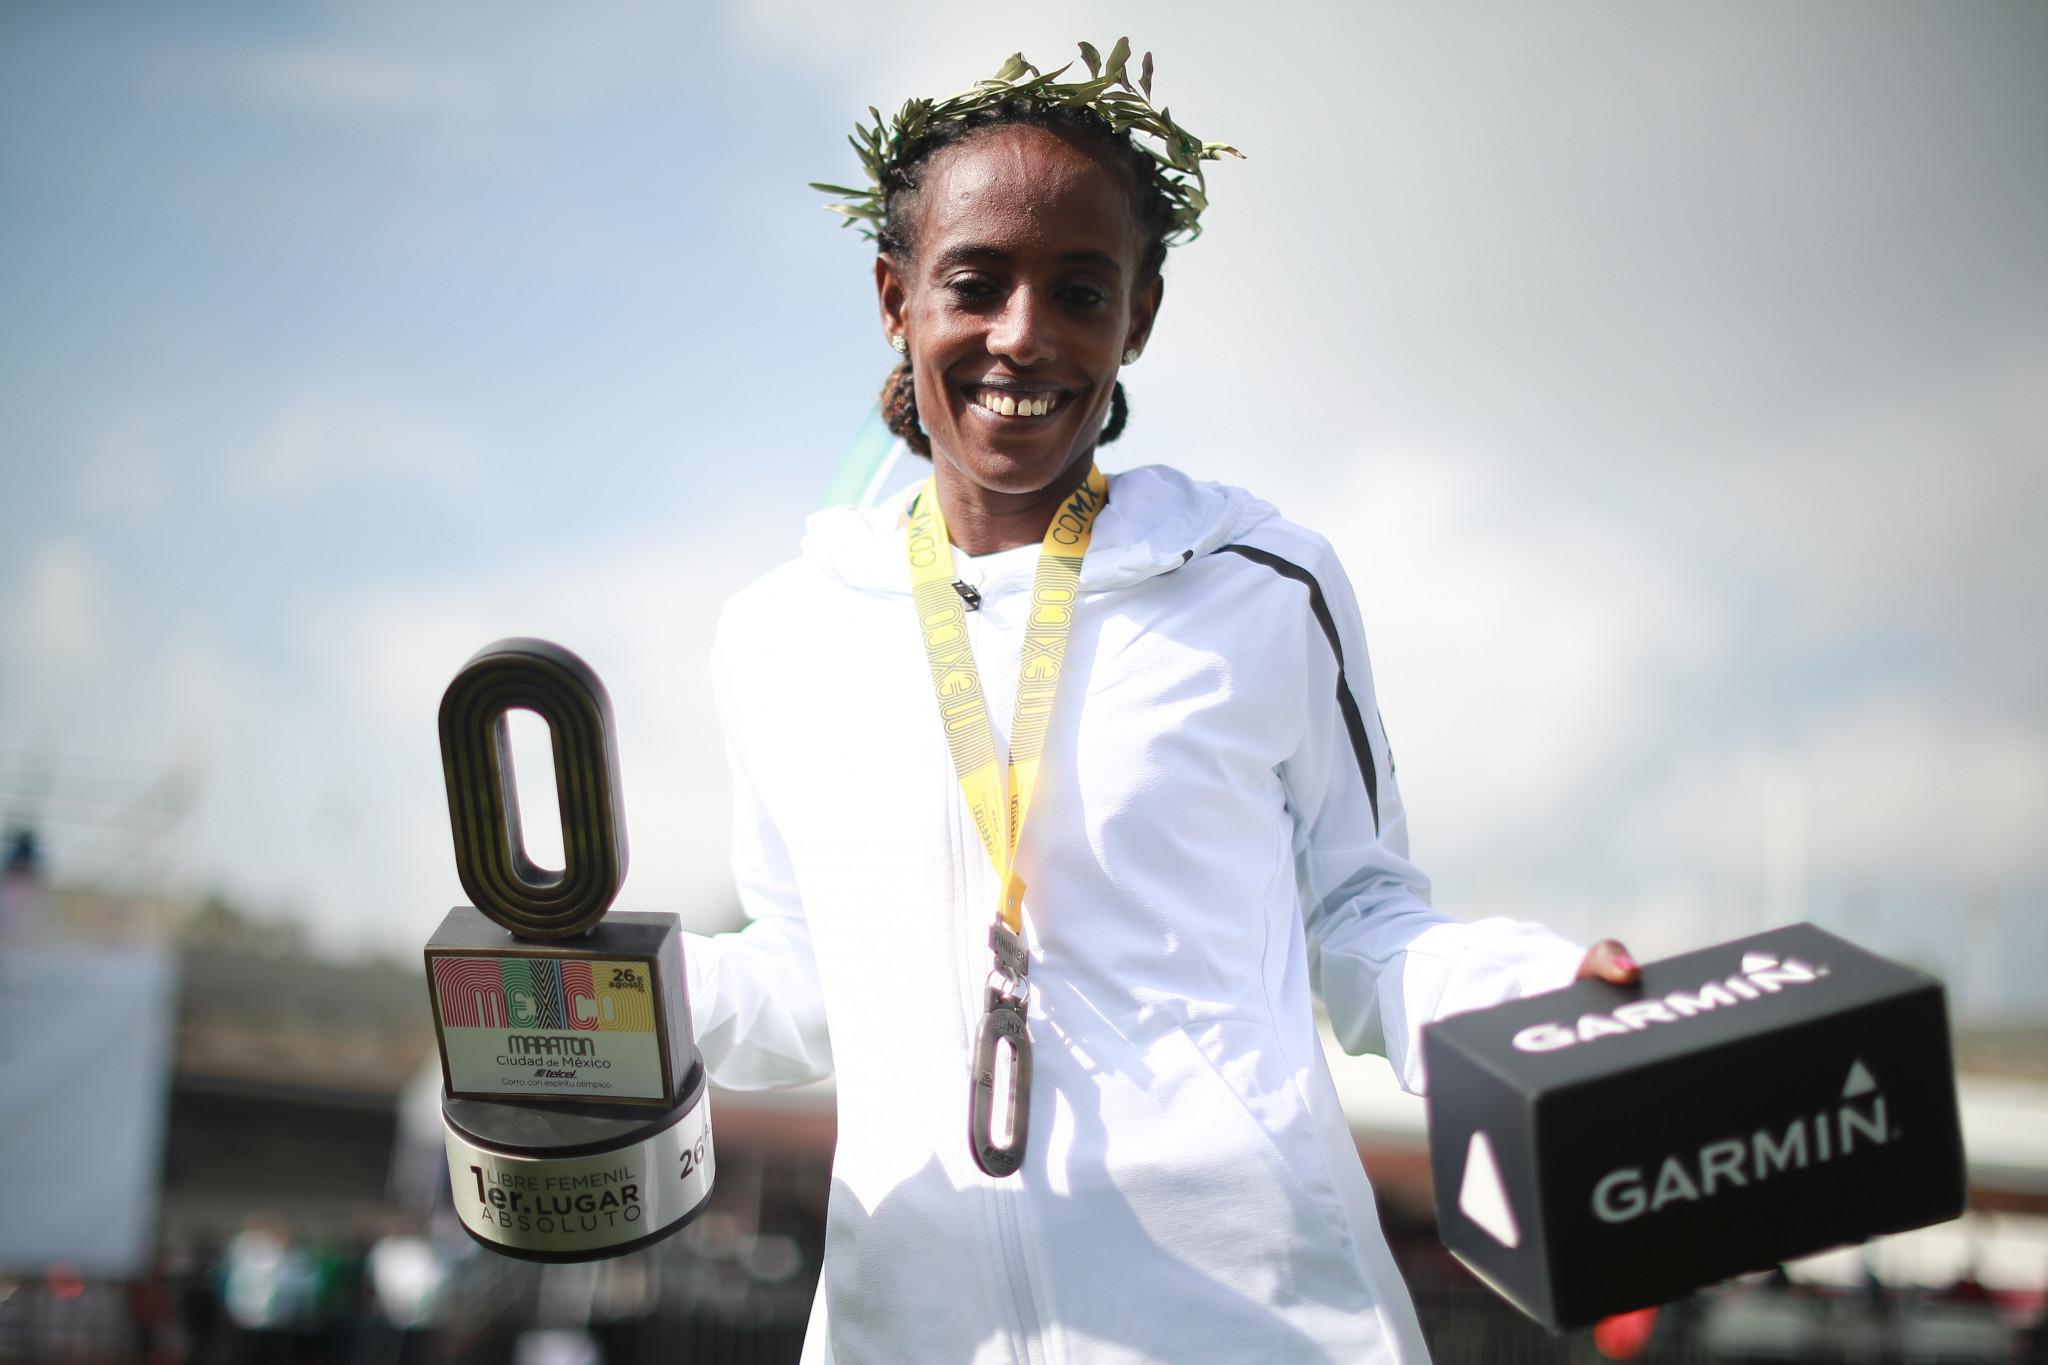 Etaferahu Temesgen Wodaj of Ethiopia won the Ciudad de México Marathon in 2018 ©Getty Images